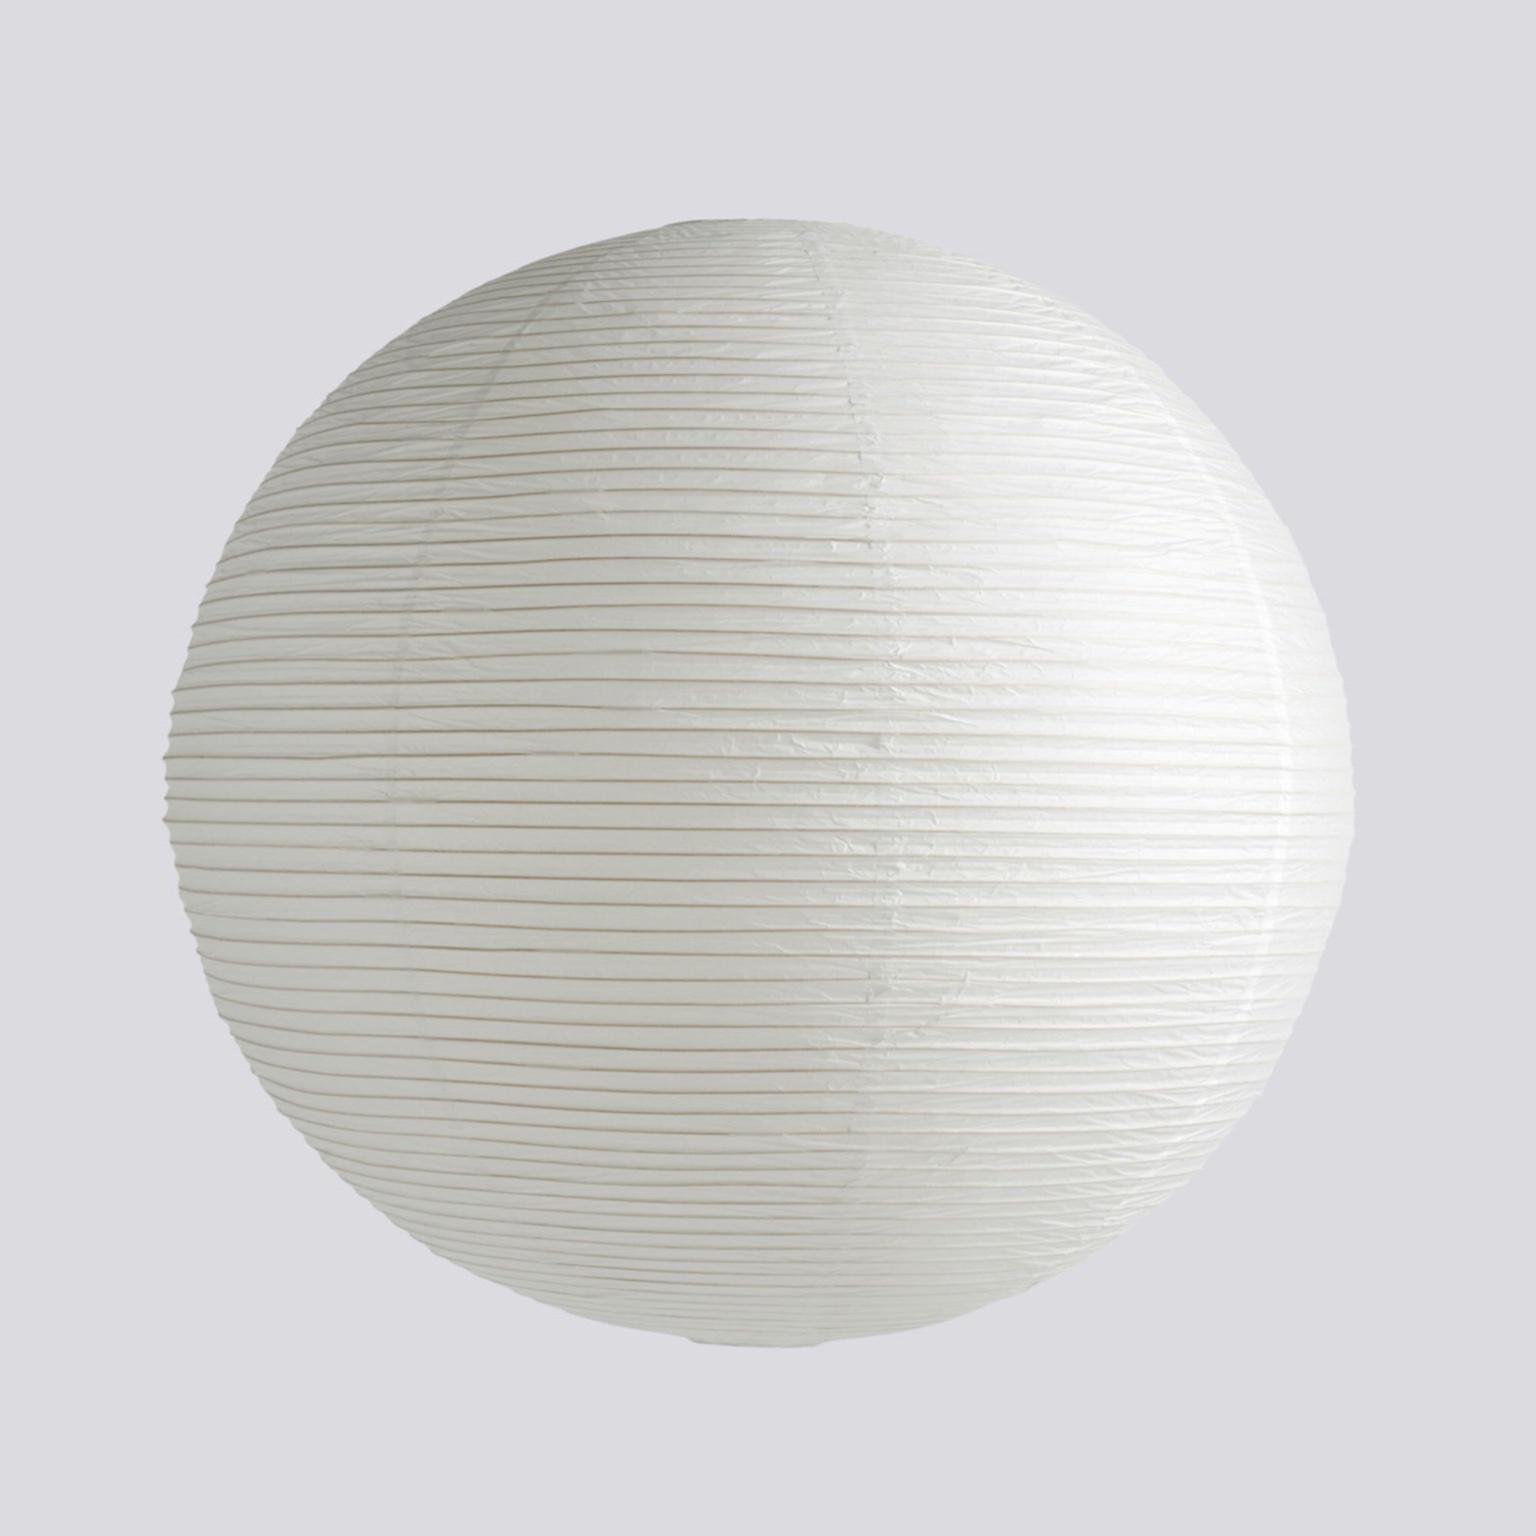 Trouva Rice Paper Lamp Shade 60cm